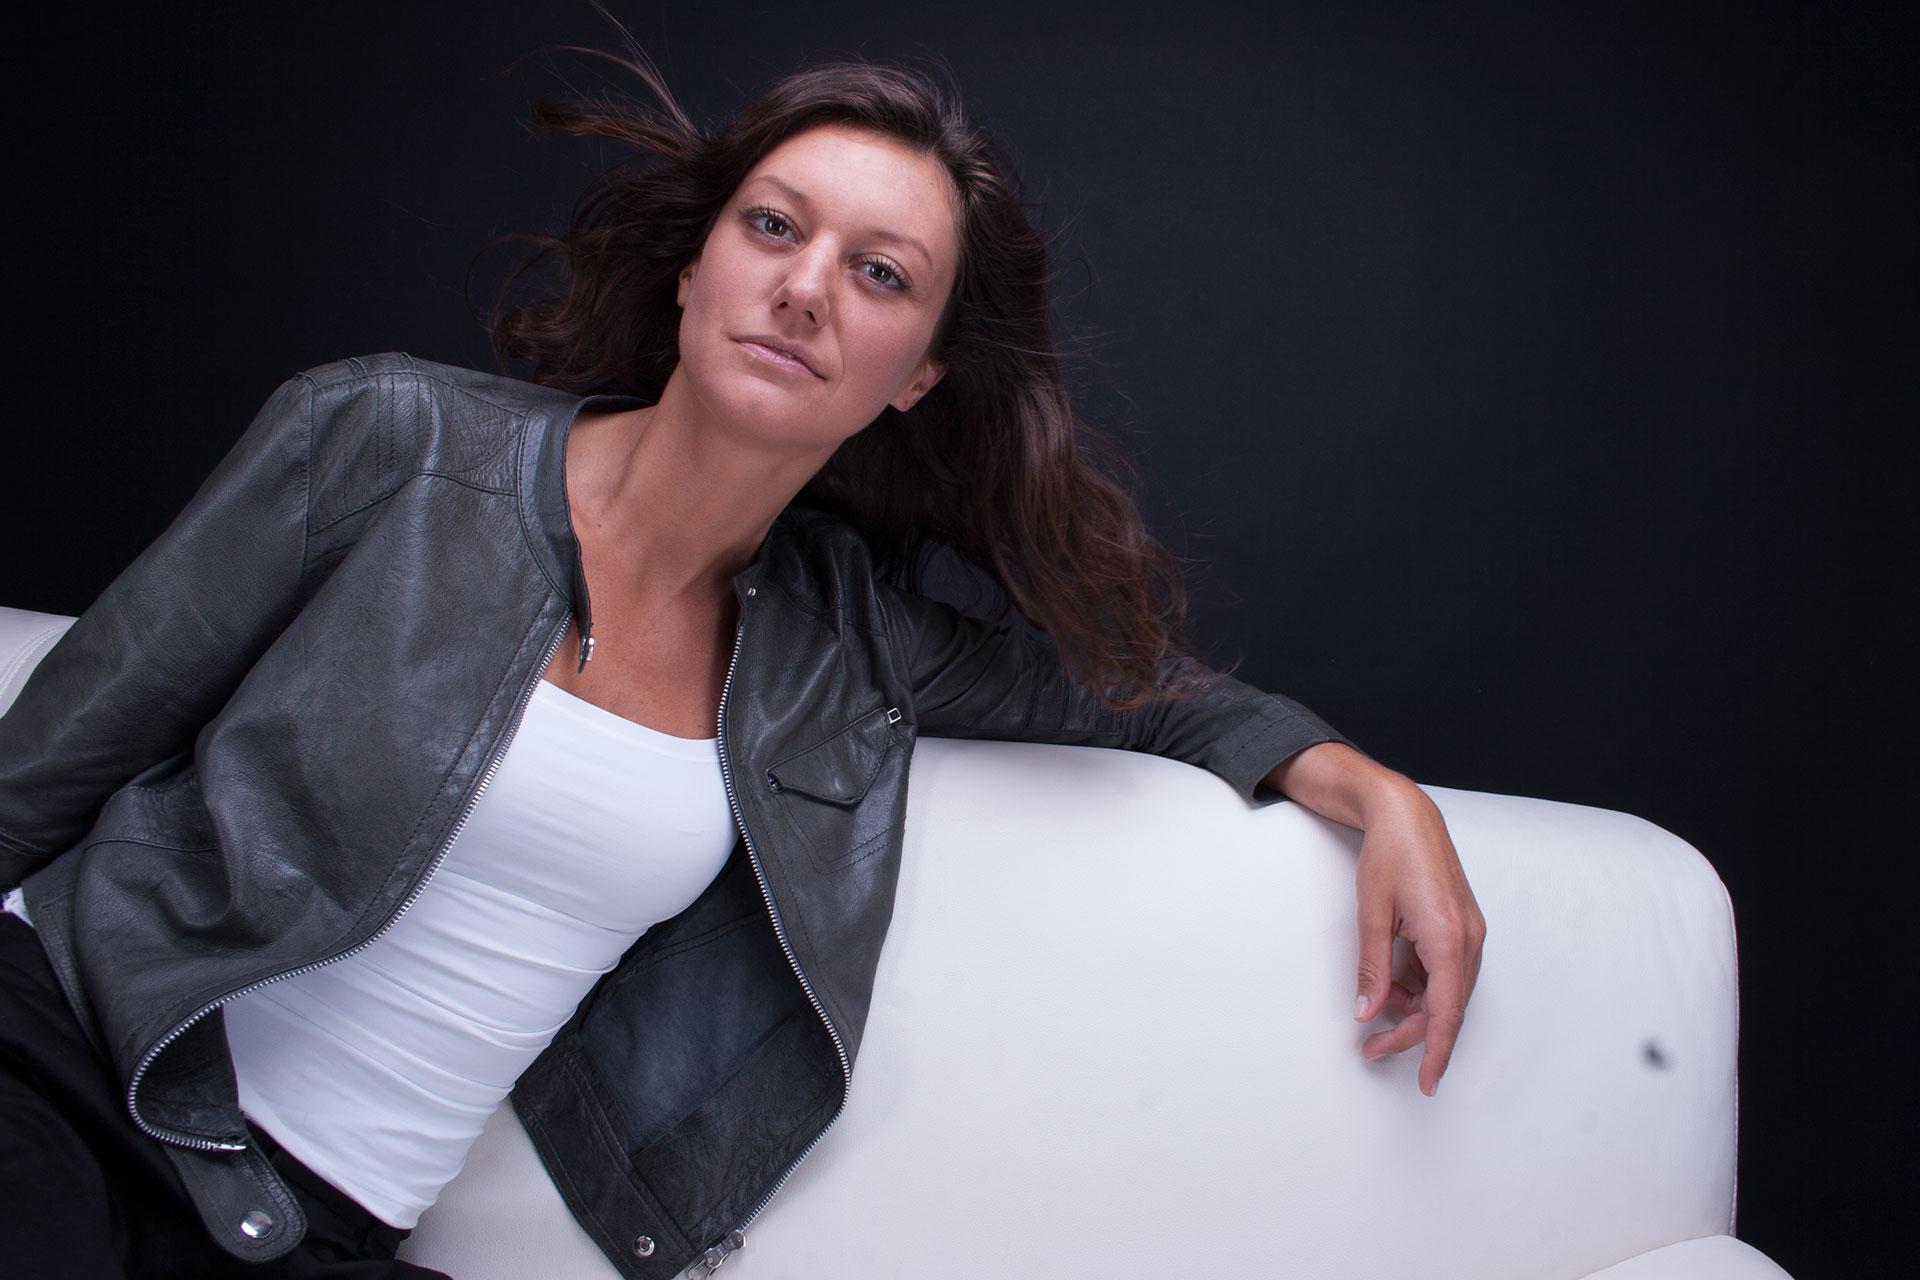 Verena Gruber, Portraitfoto